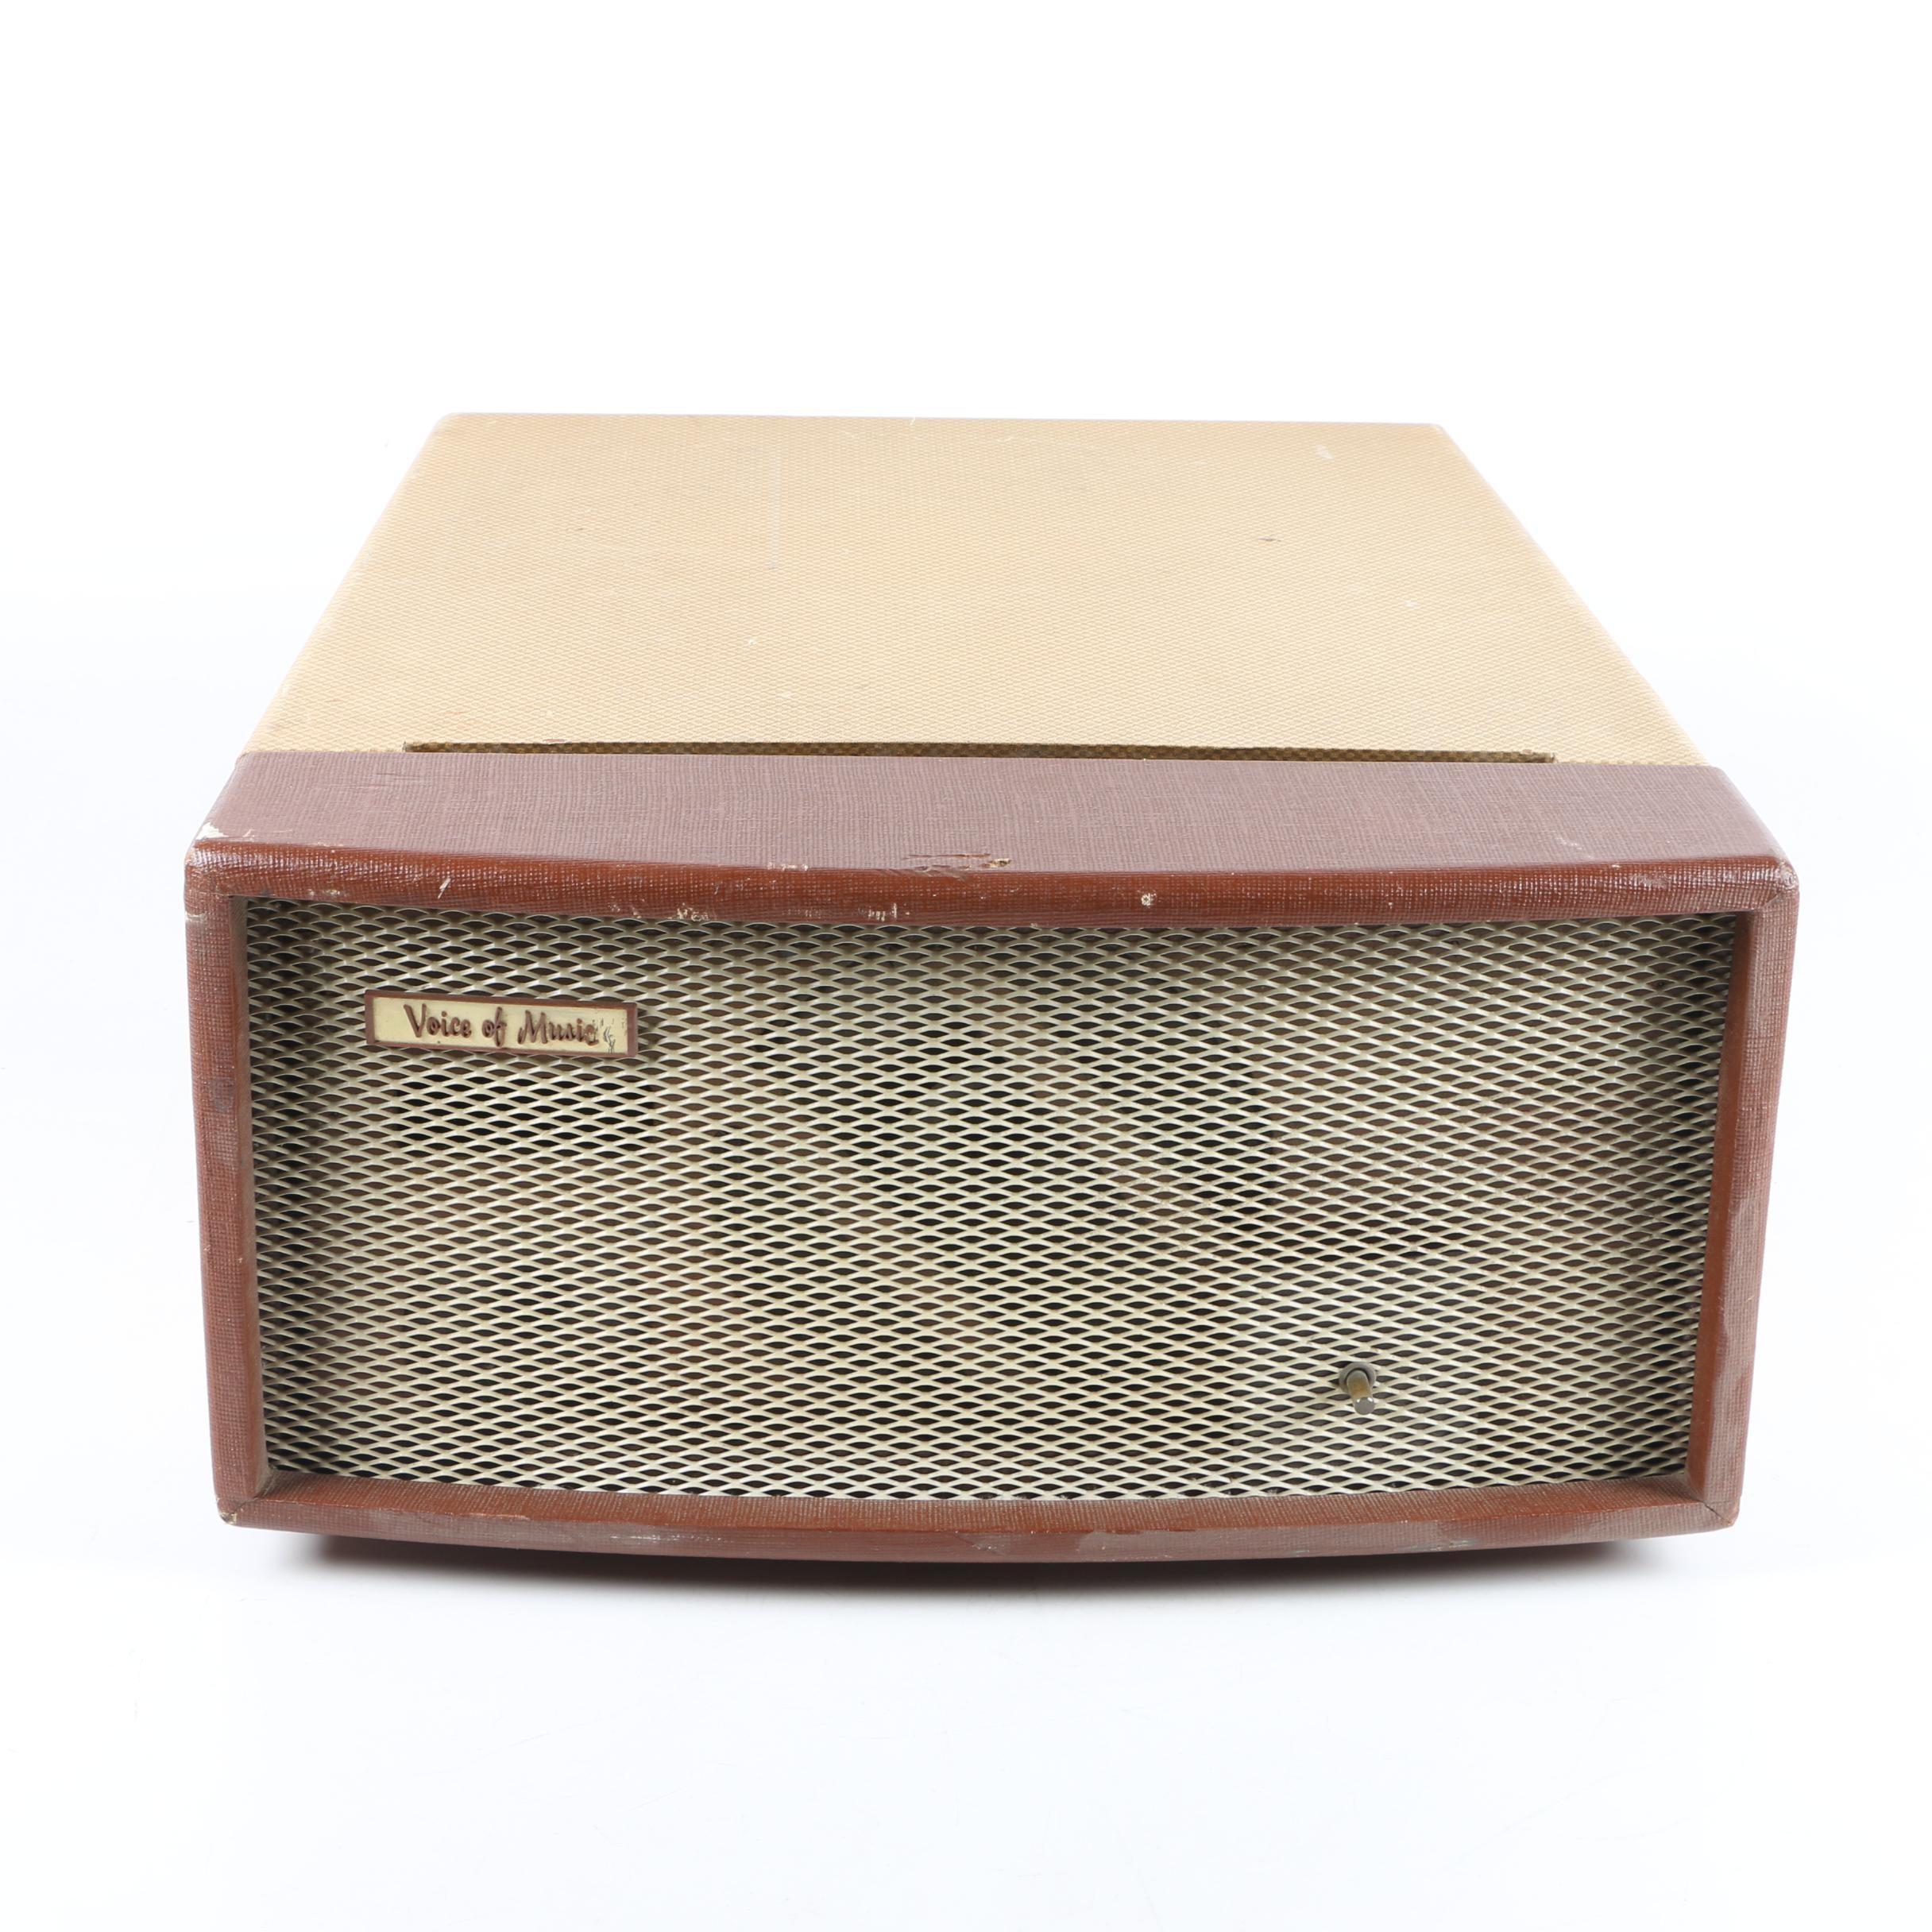 Vintage Voice of Music High Fidelity Phonograph Radio